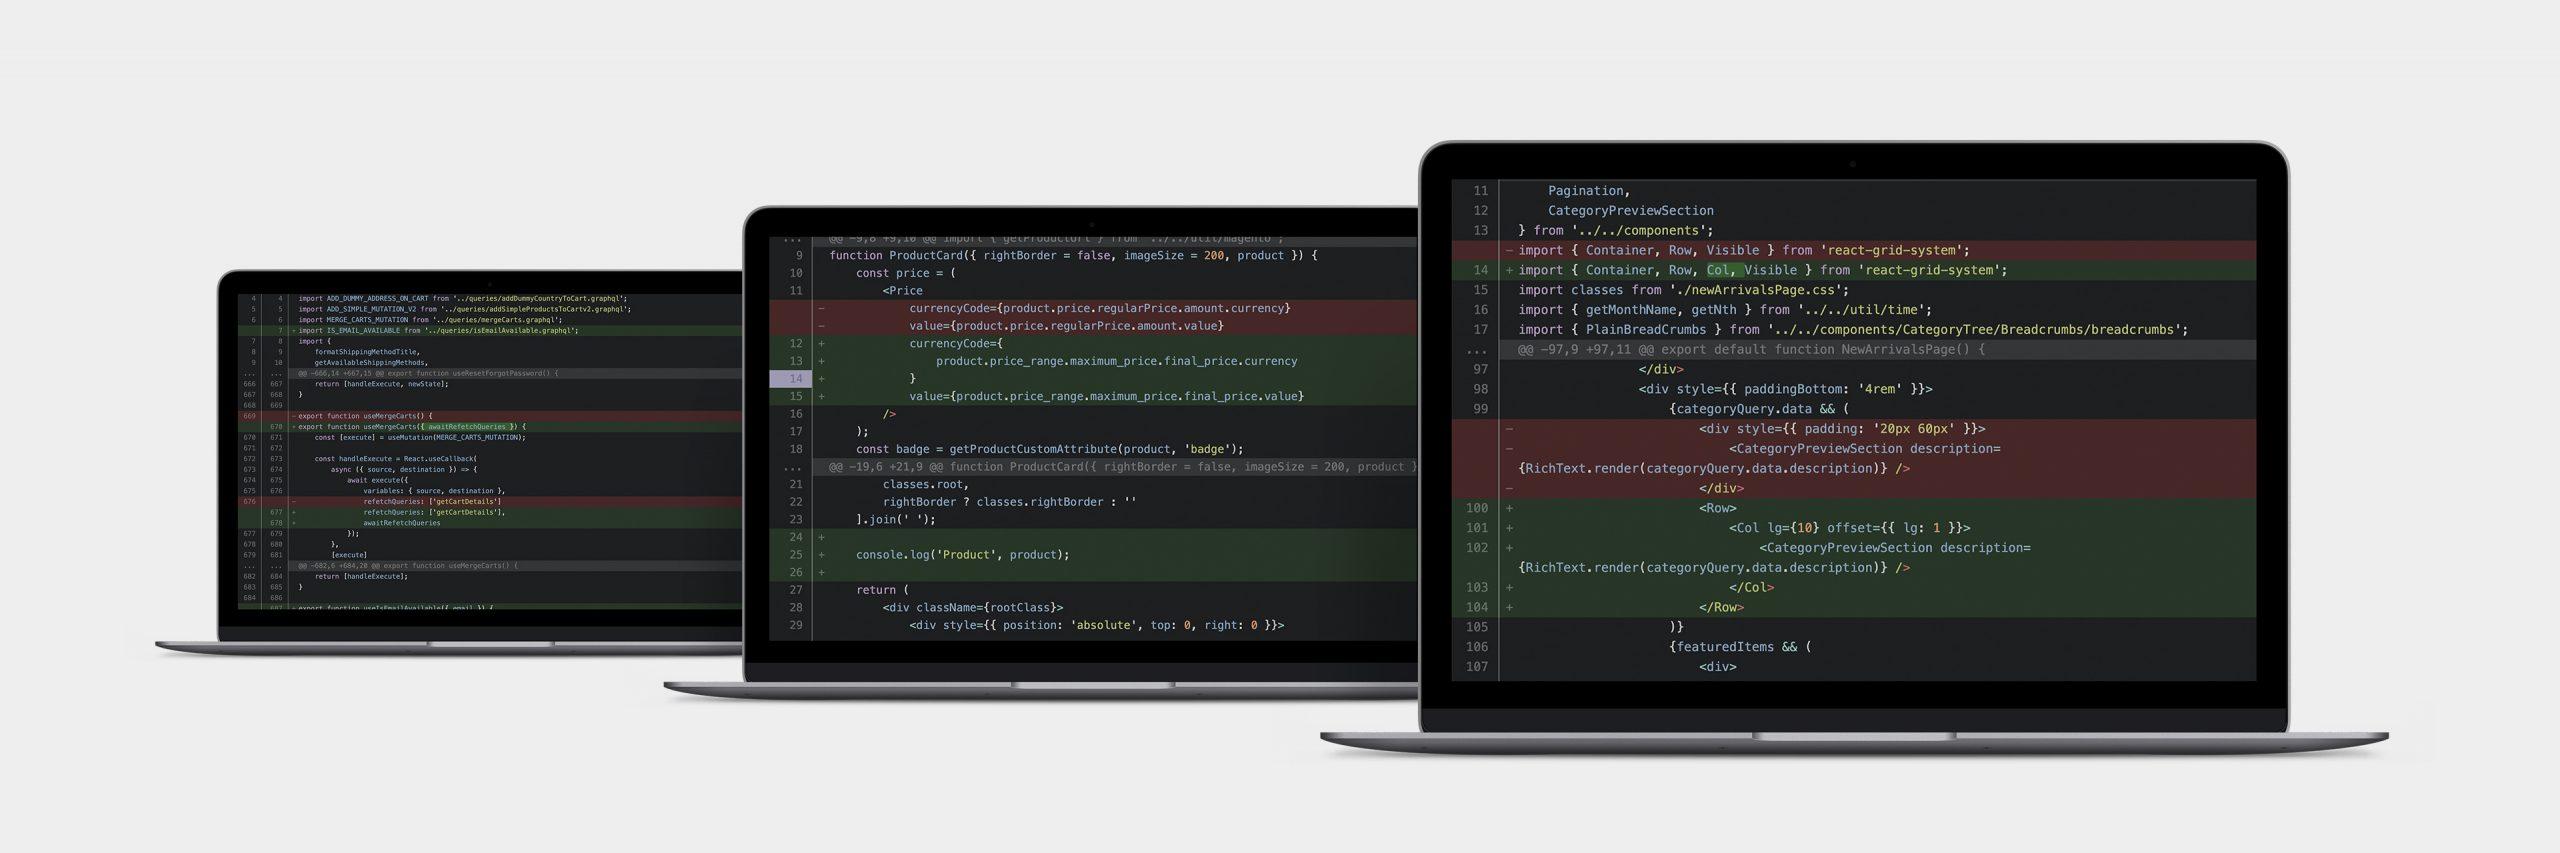 ecommrece development script on screens by Digital Six